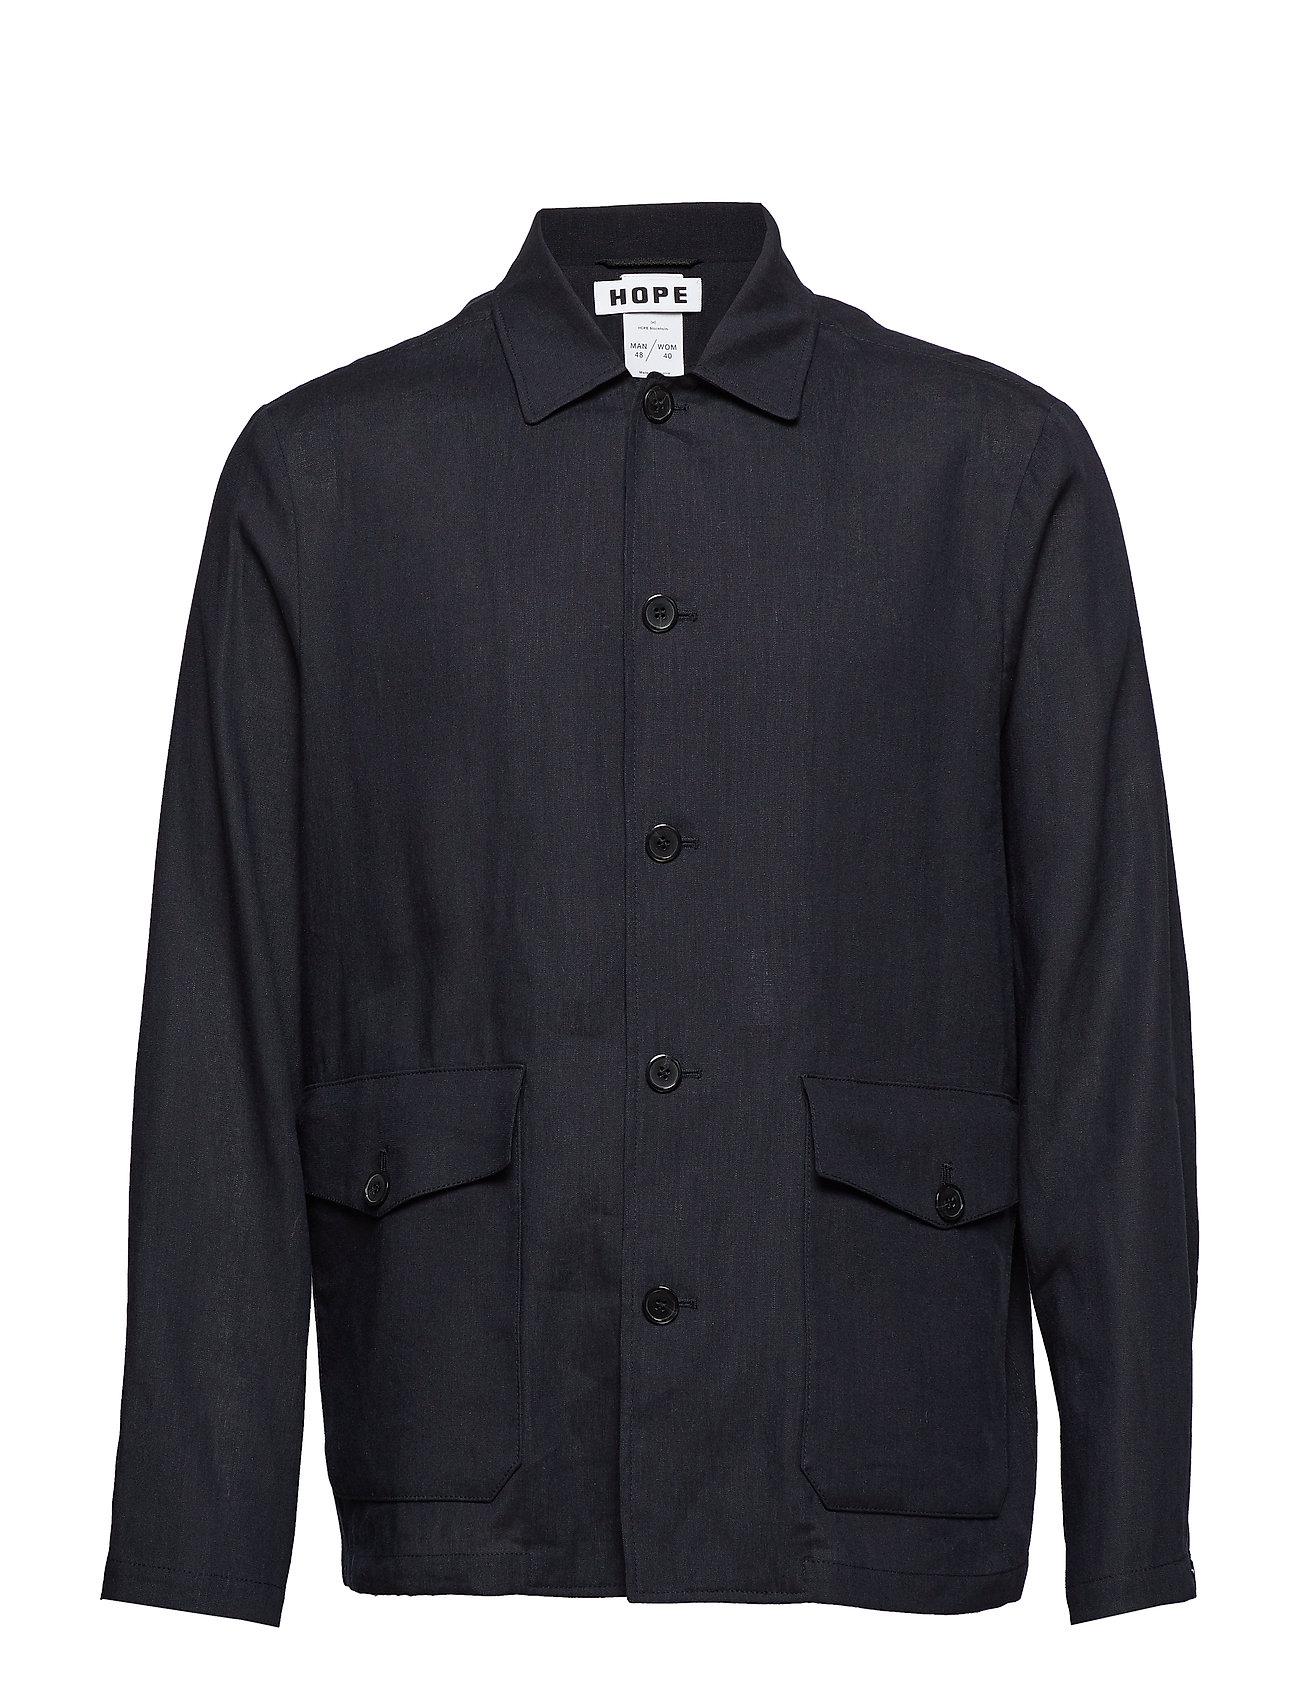 Hope Shirt Jacket - DK BLUE